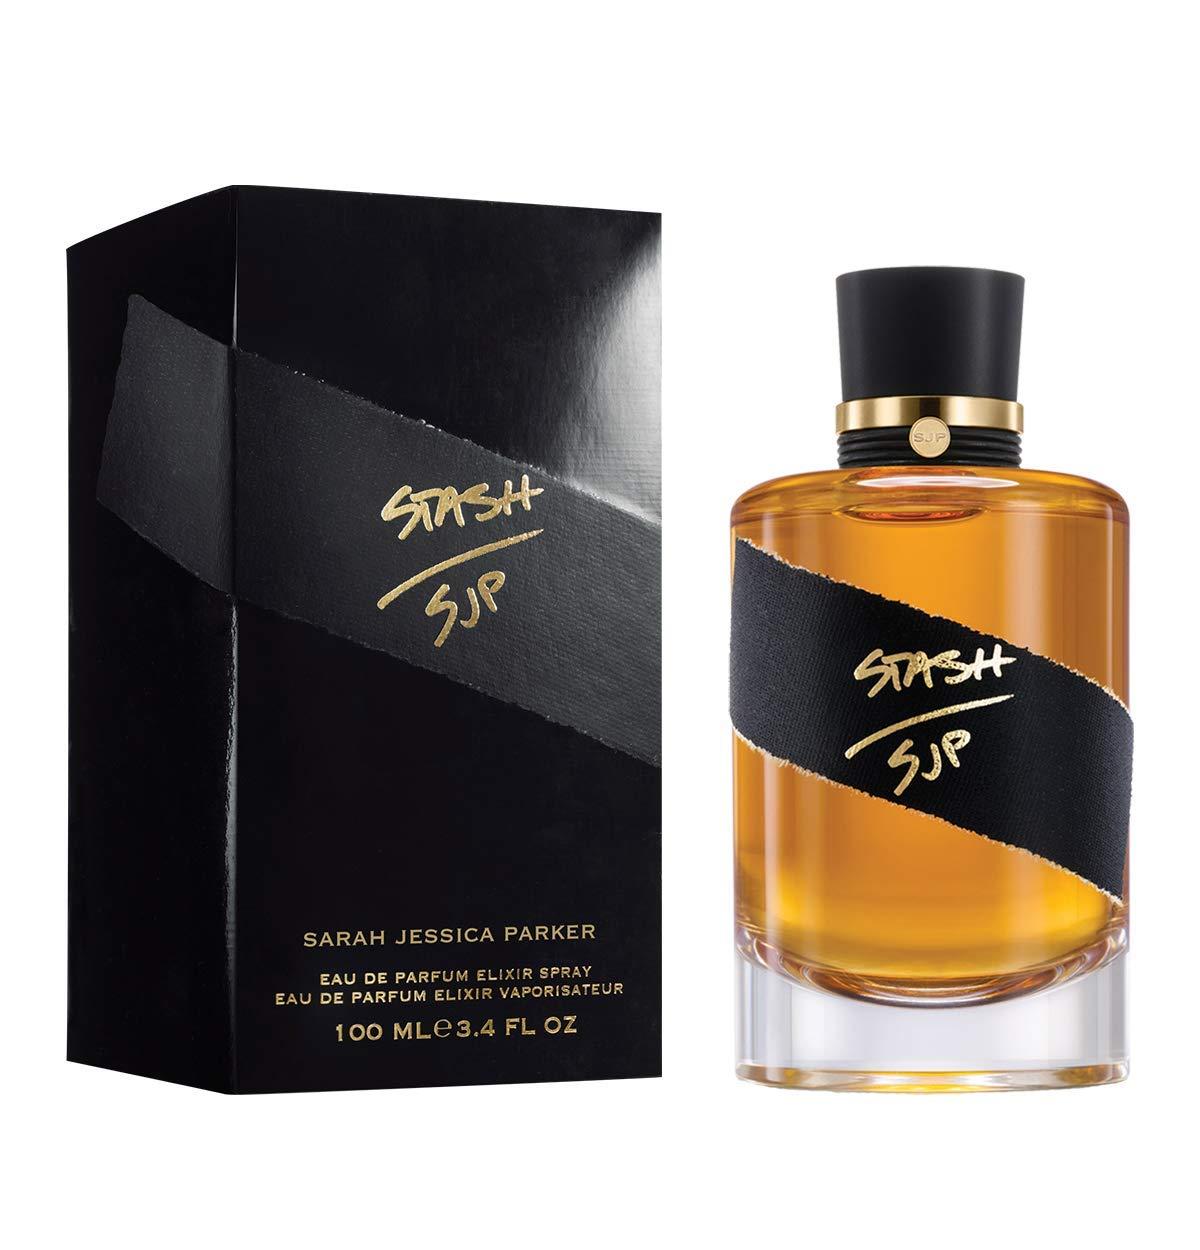 Sarah Jessica Parker Stash Max 87% OFF Eau SJP Seasonal Wrap Introduction Parfum Fragrance de Spray